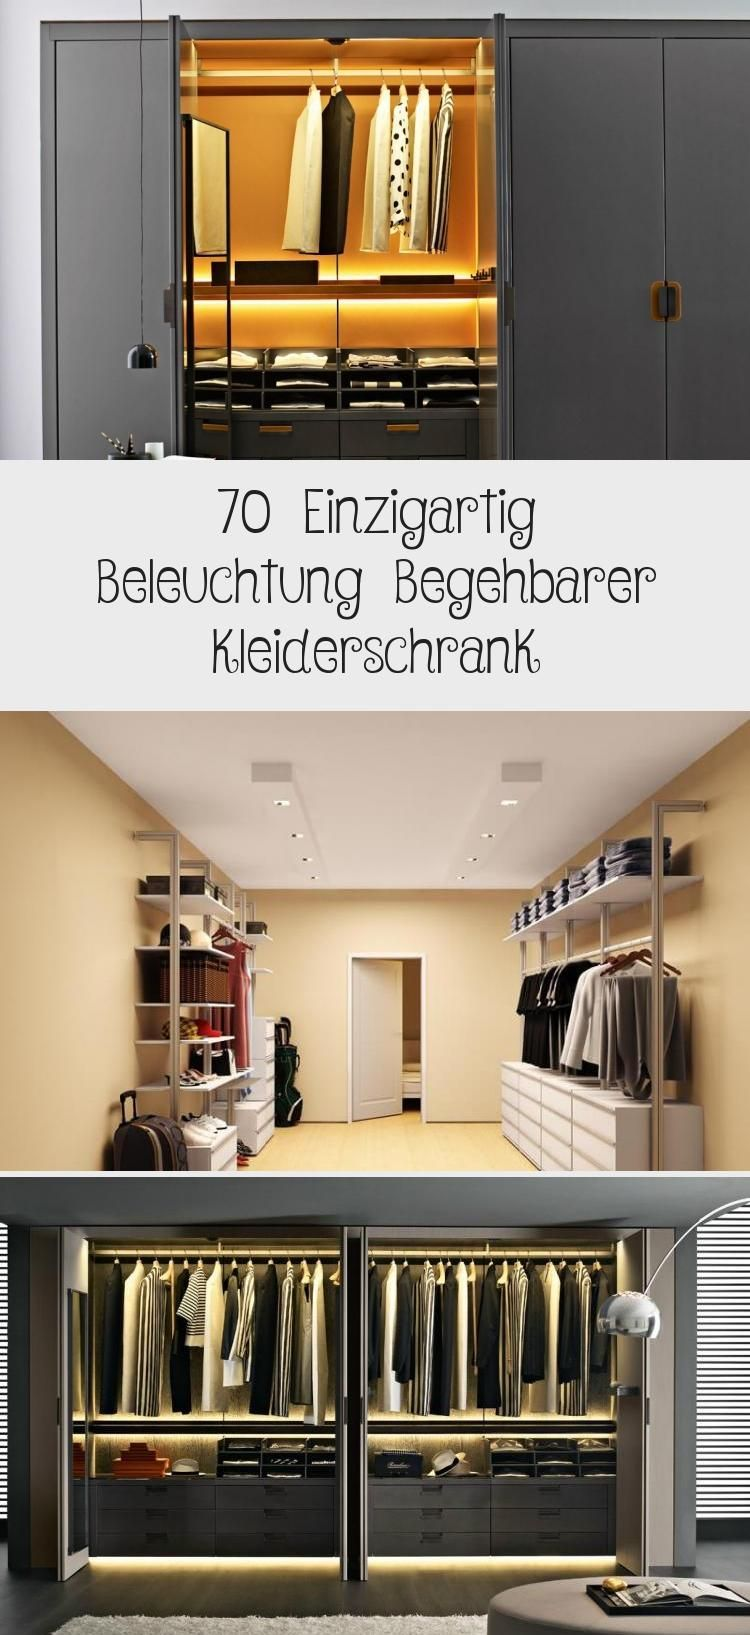 70 Einzigartig Beleuchtung Begehbarer Kleiderschrank Ankleidezimmerdesign Begehbarer Kleiderschrank Begehbarer Kleiderschrank Dachschrage Und Kleiderschrank